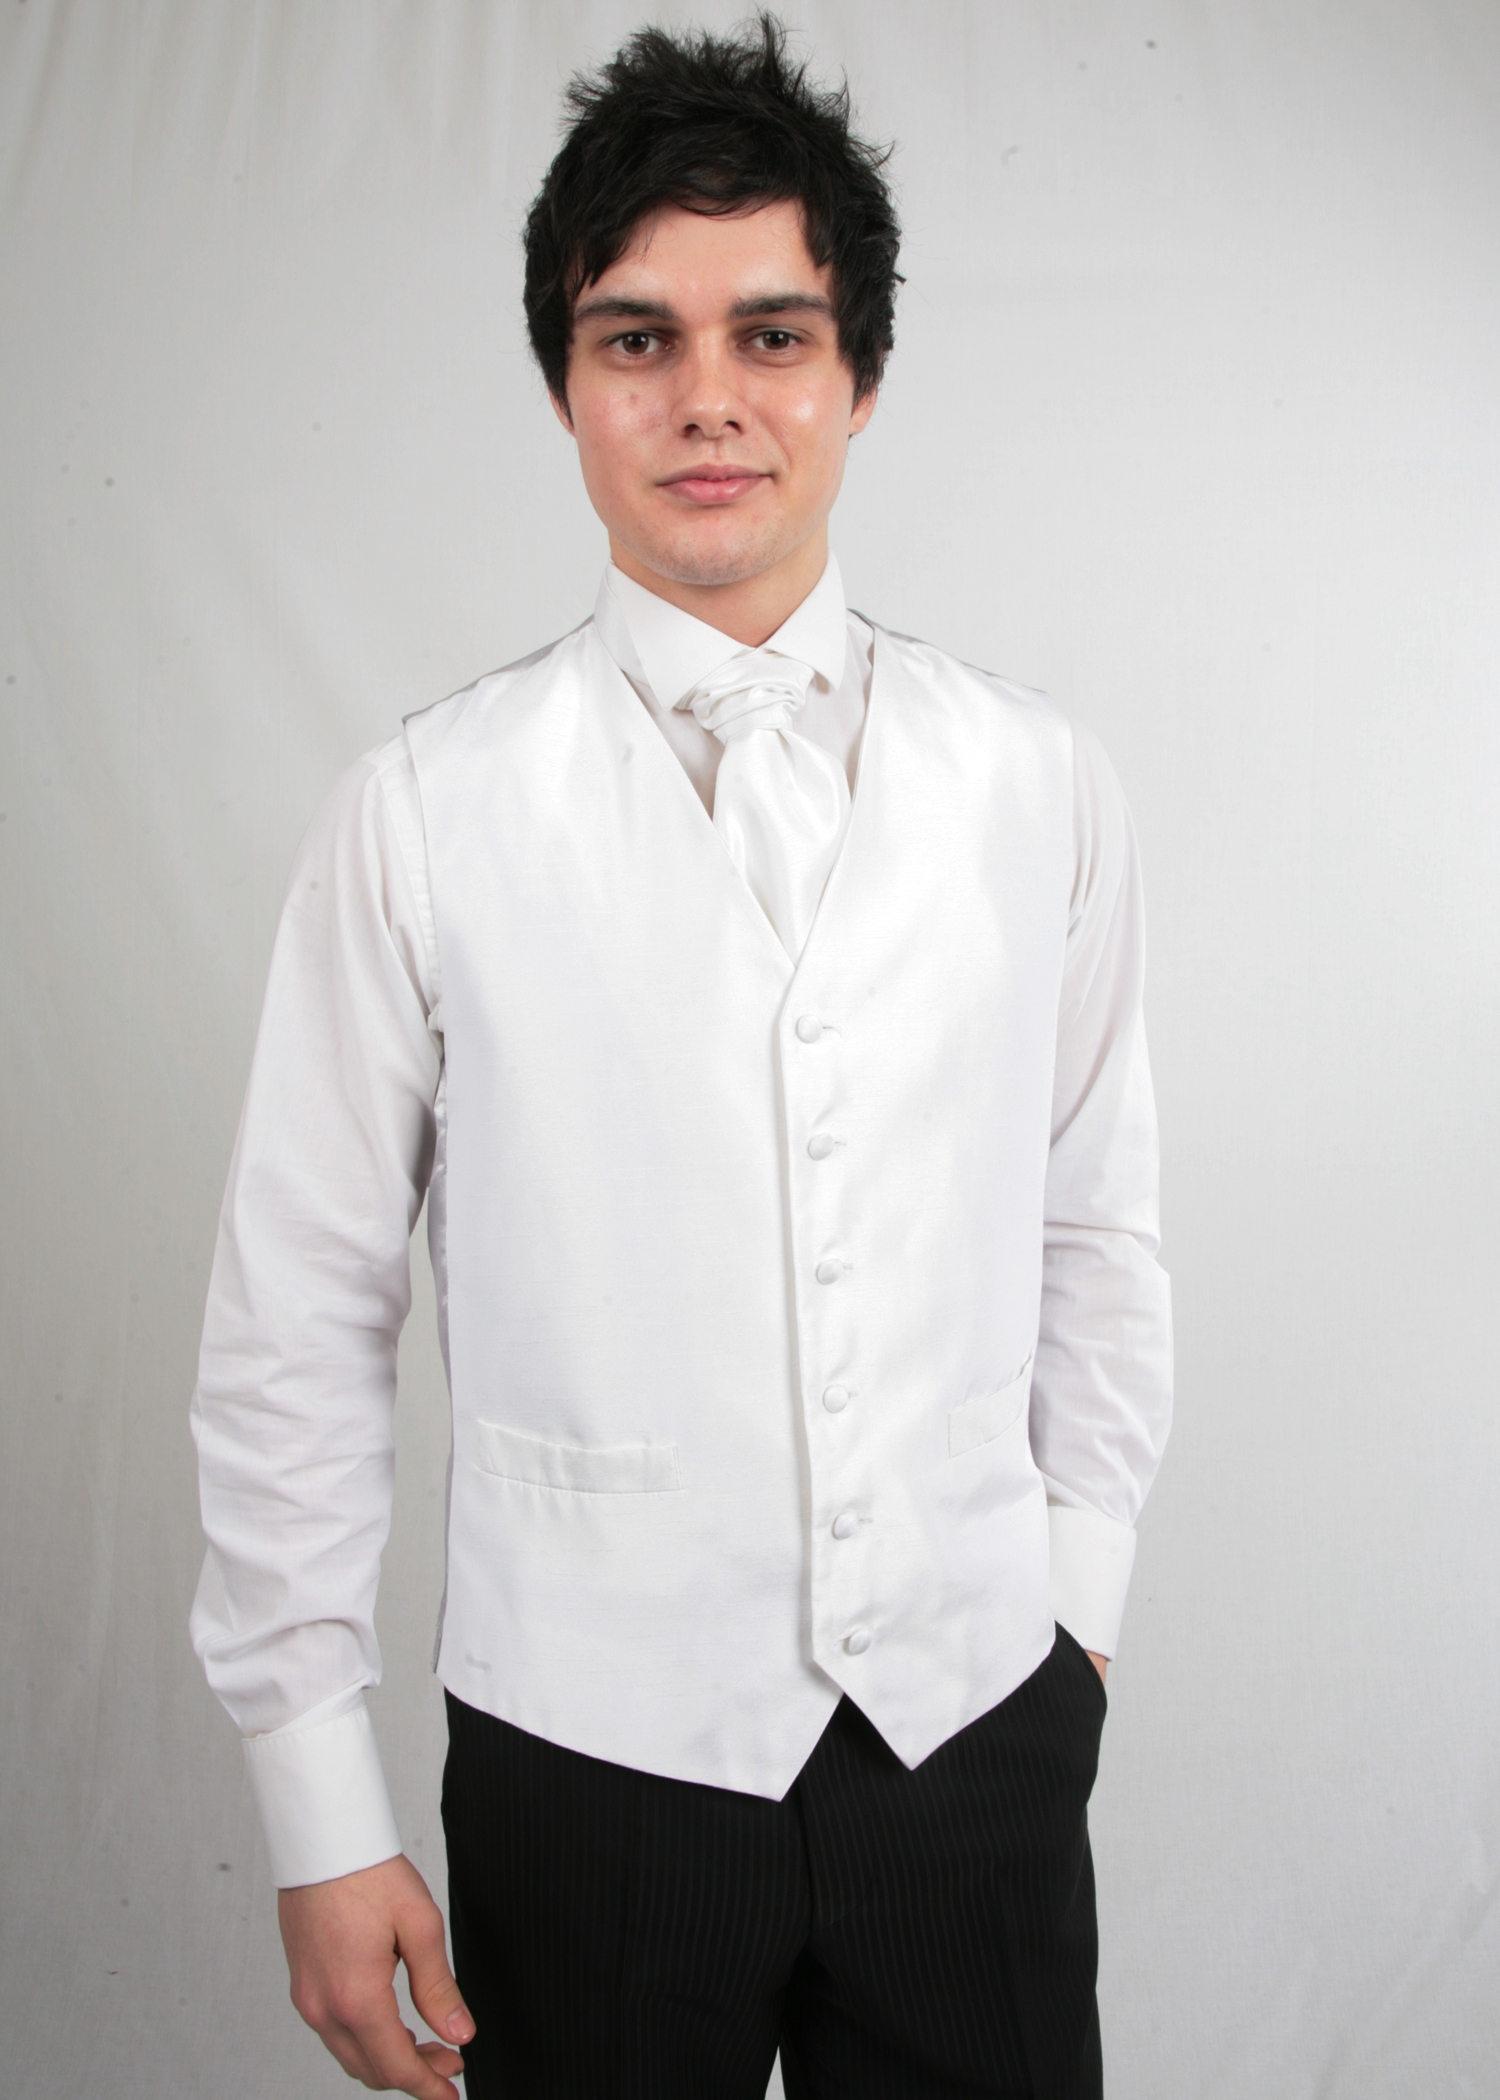 Black Wilvorst Pinstripe Suit for Hire